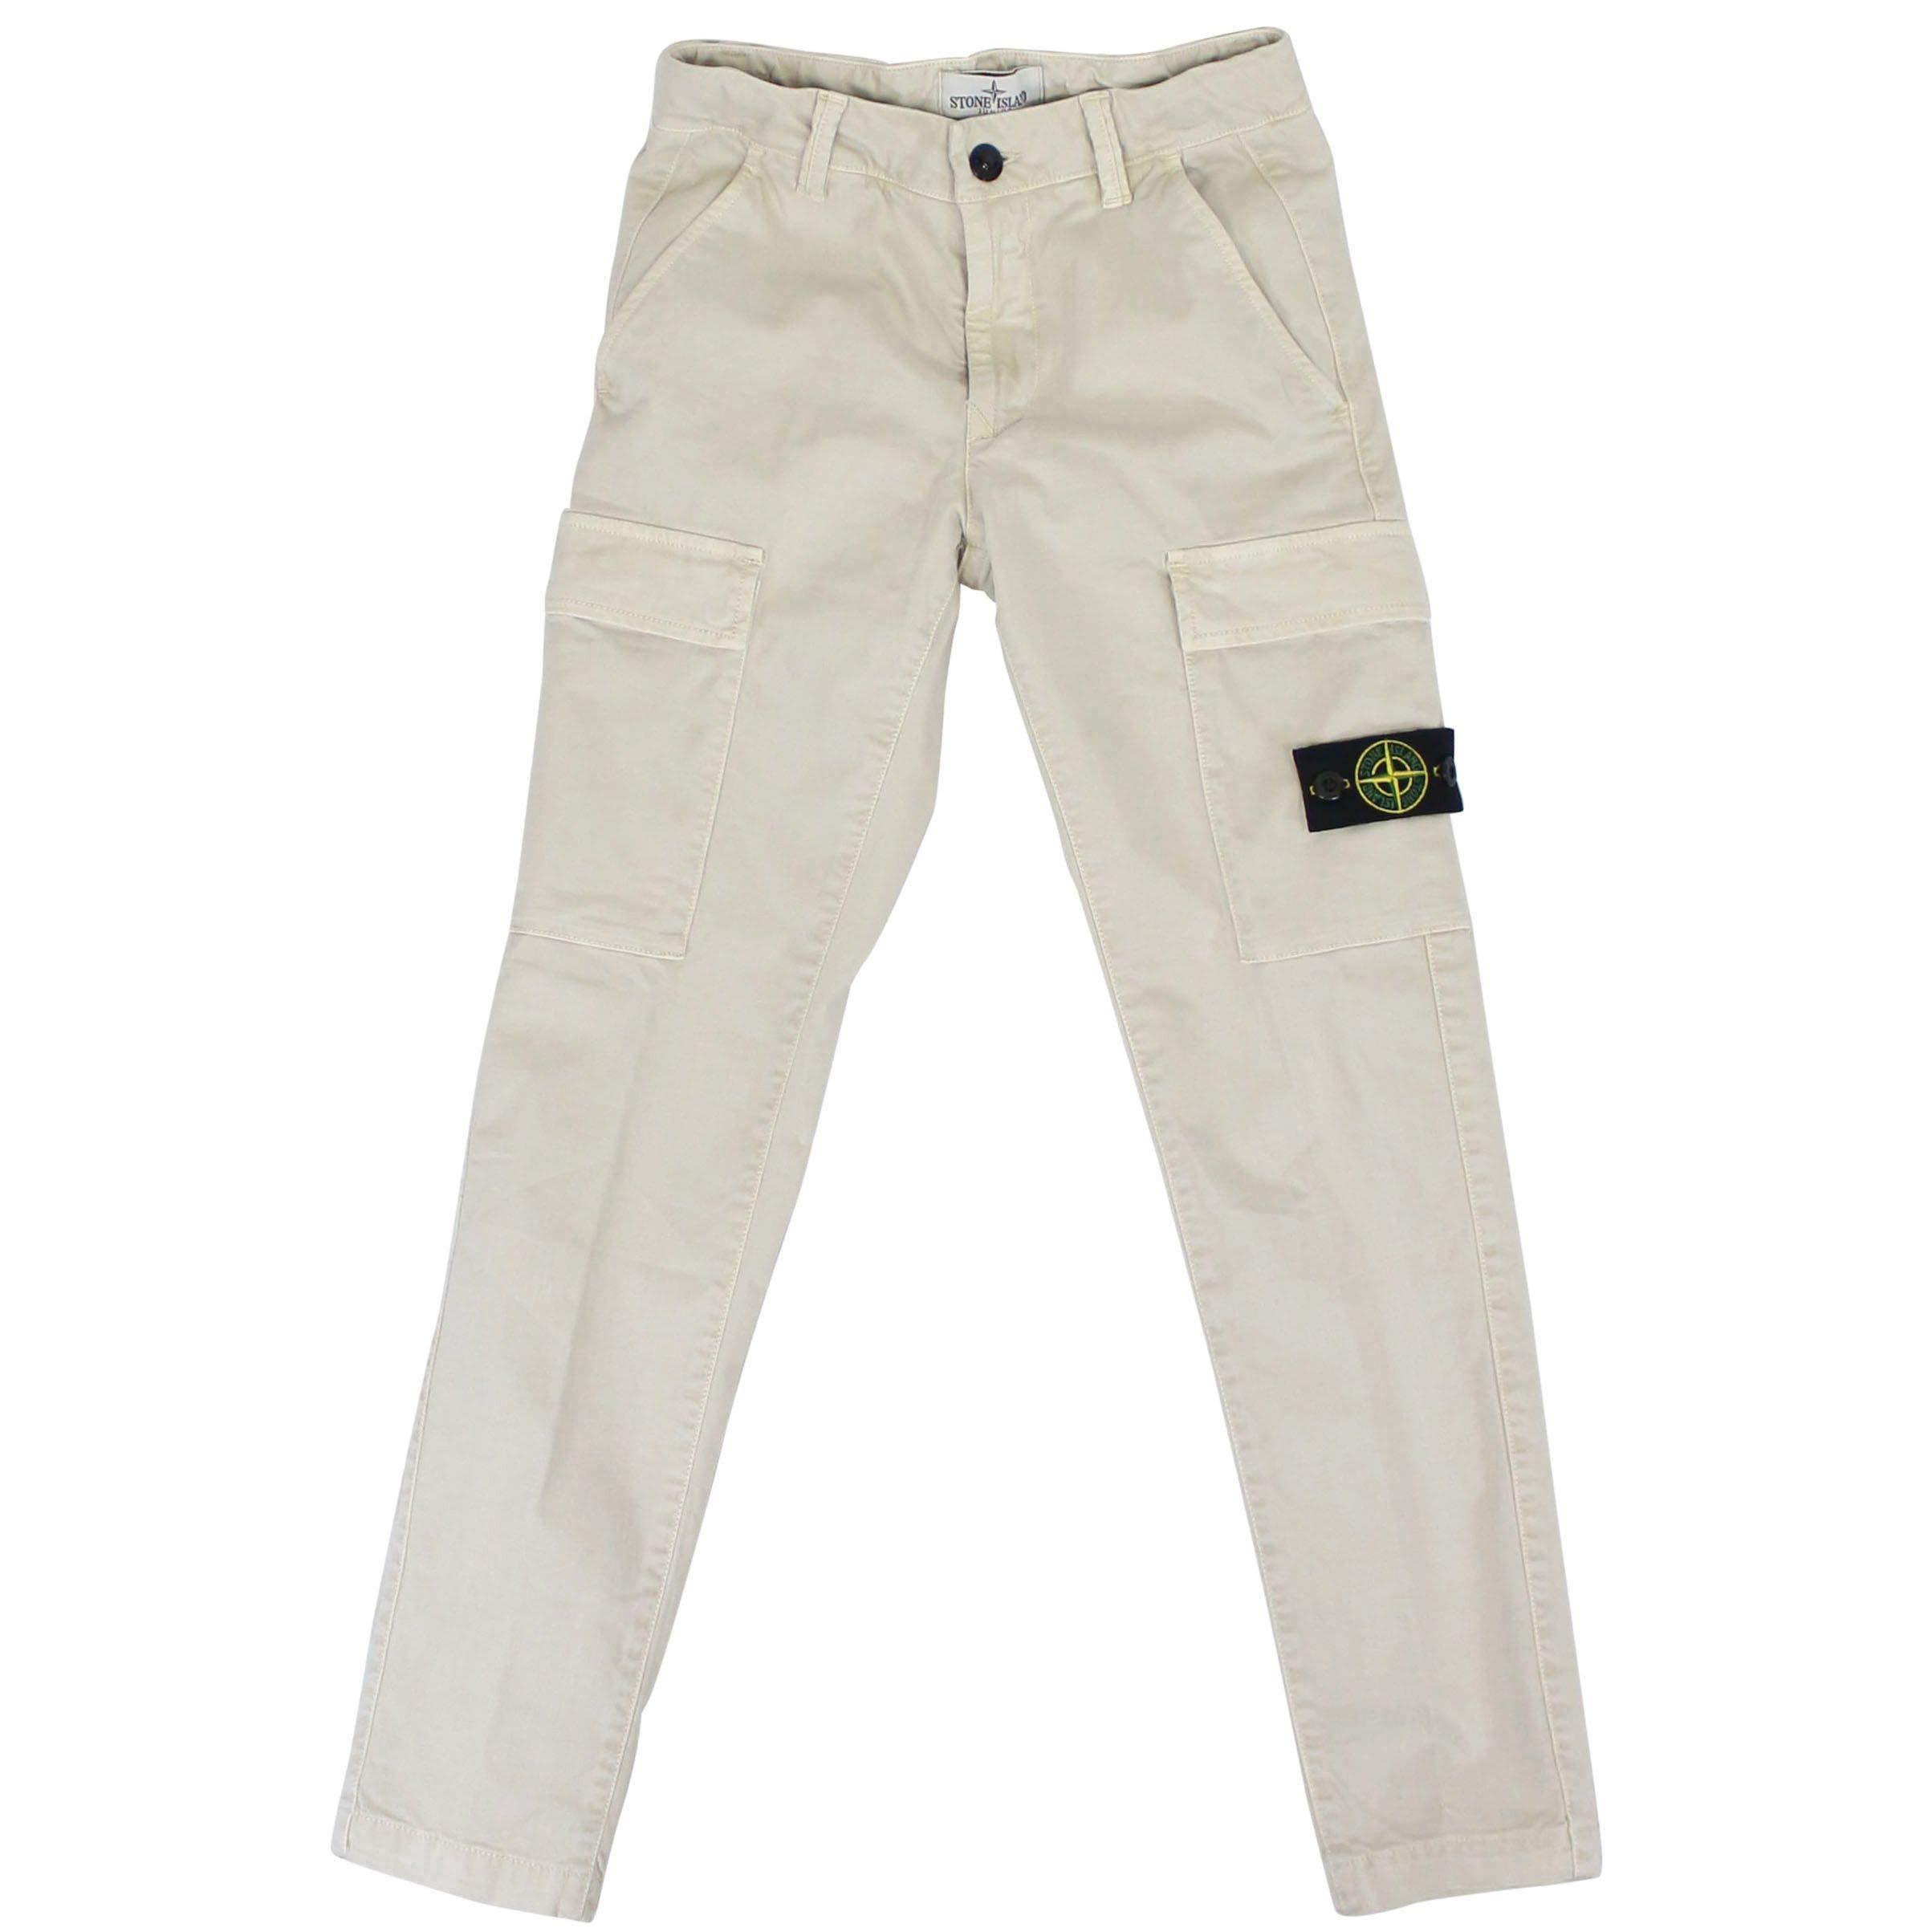 Stone Island Boys 701630312V0197 Beige Cotton Pants